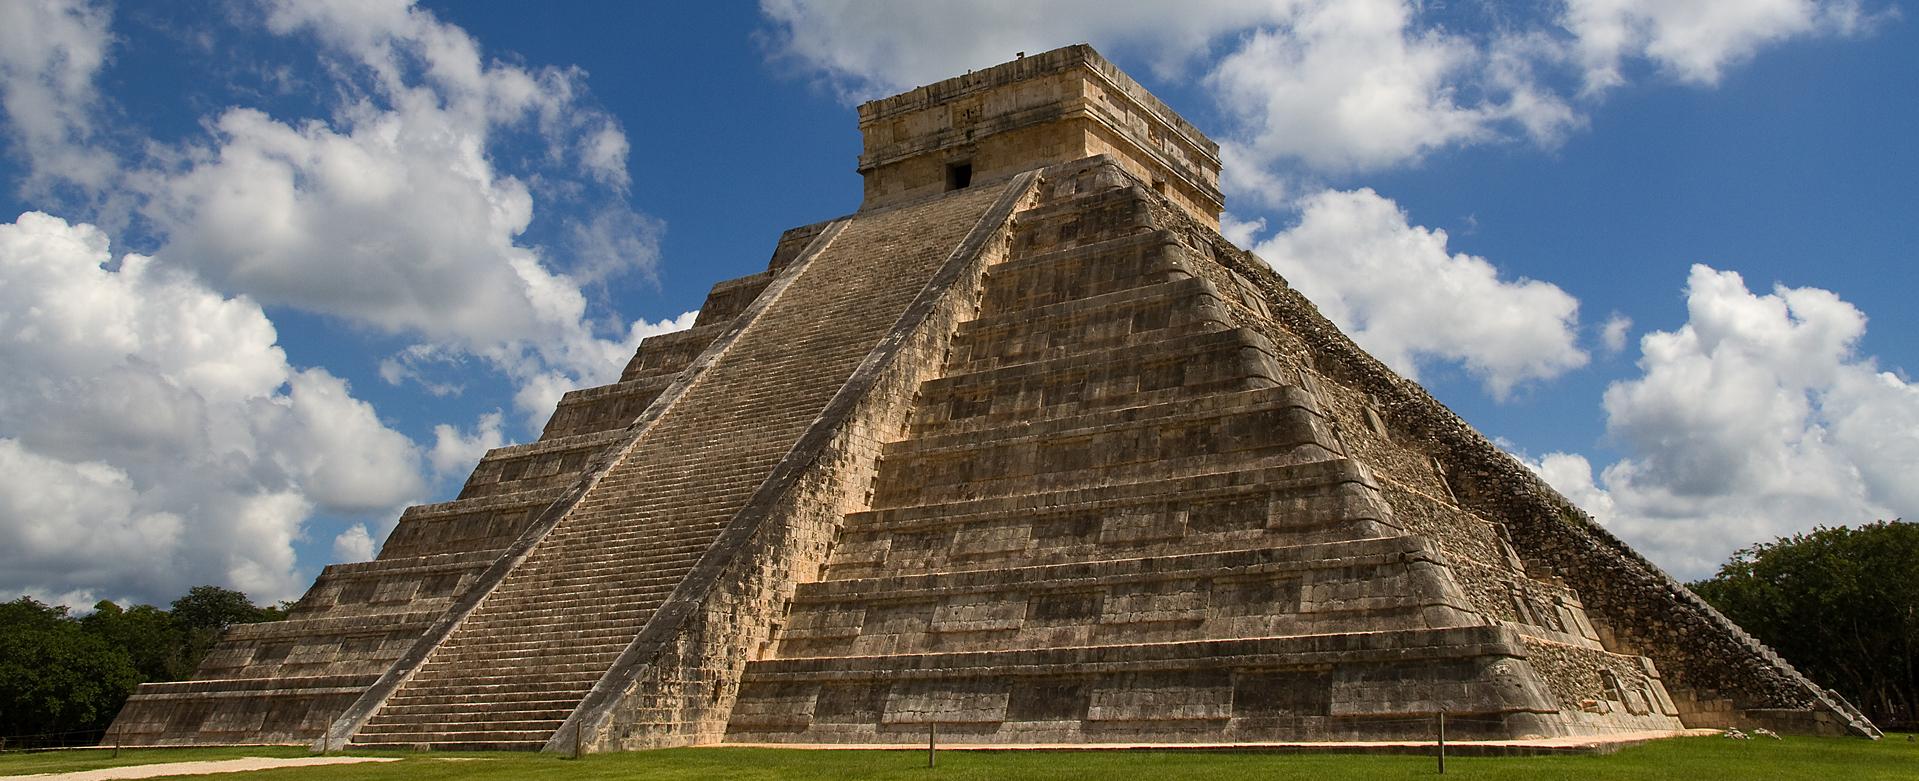 Sitchin Thoth Created Yucatan S Maya Web Radio Article Illustrations